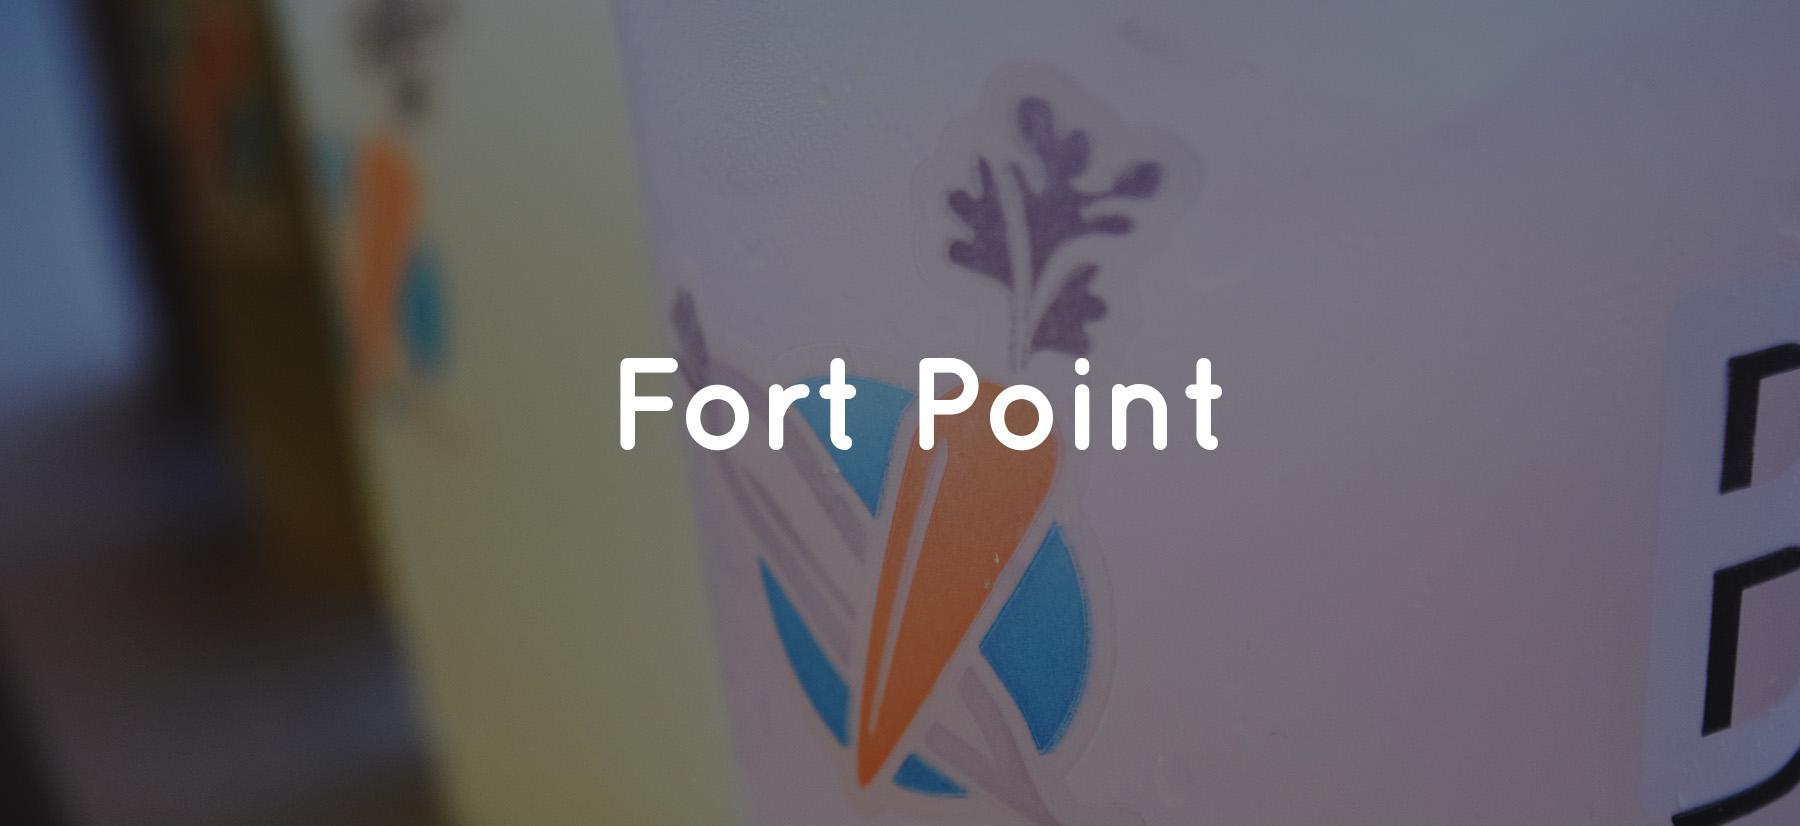 FORT POINT 2.jpg